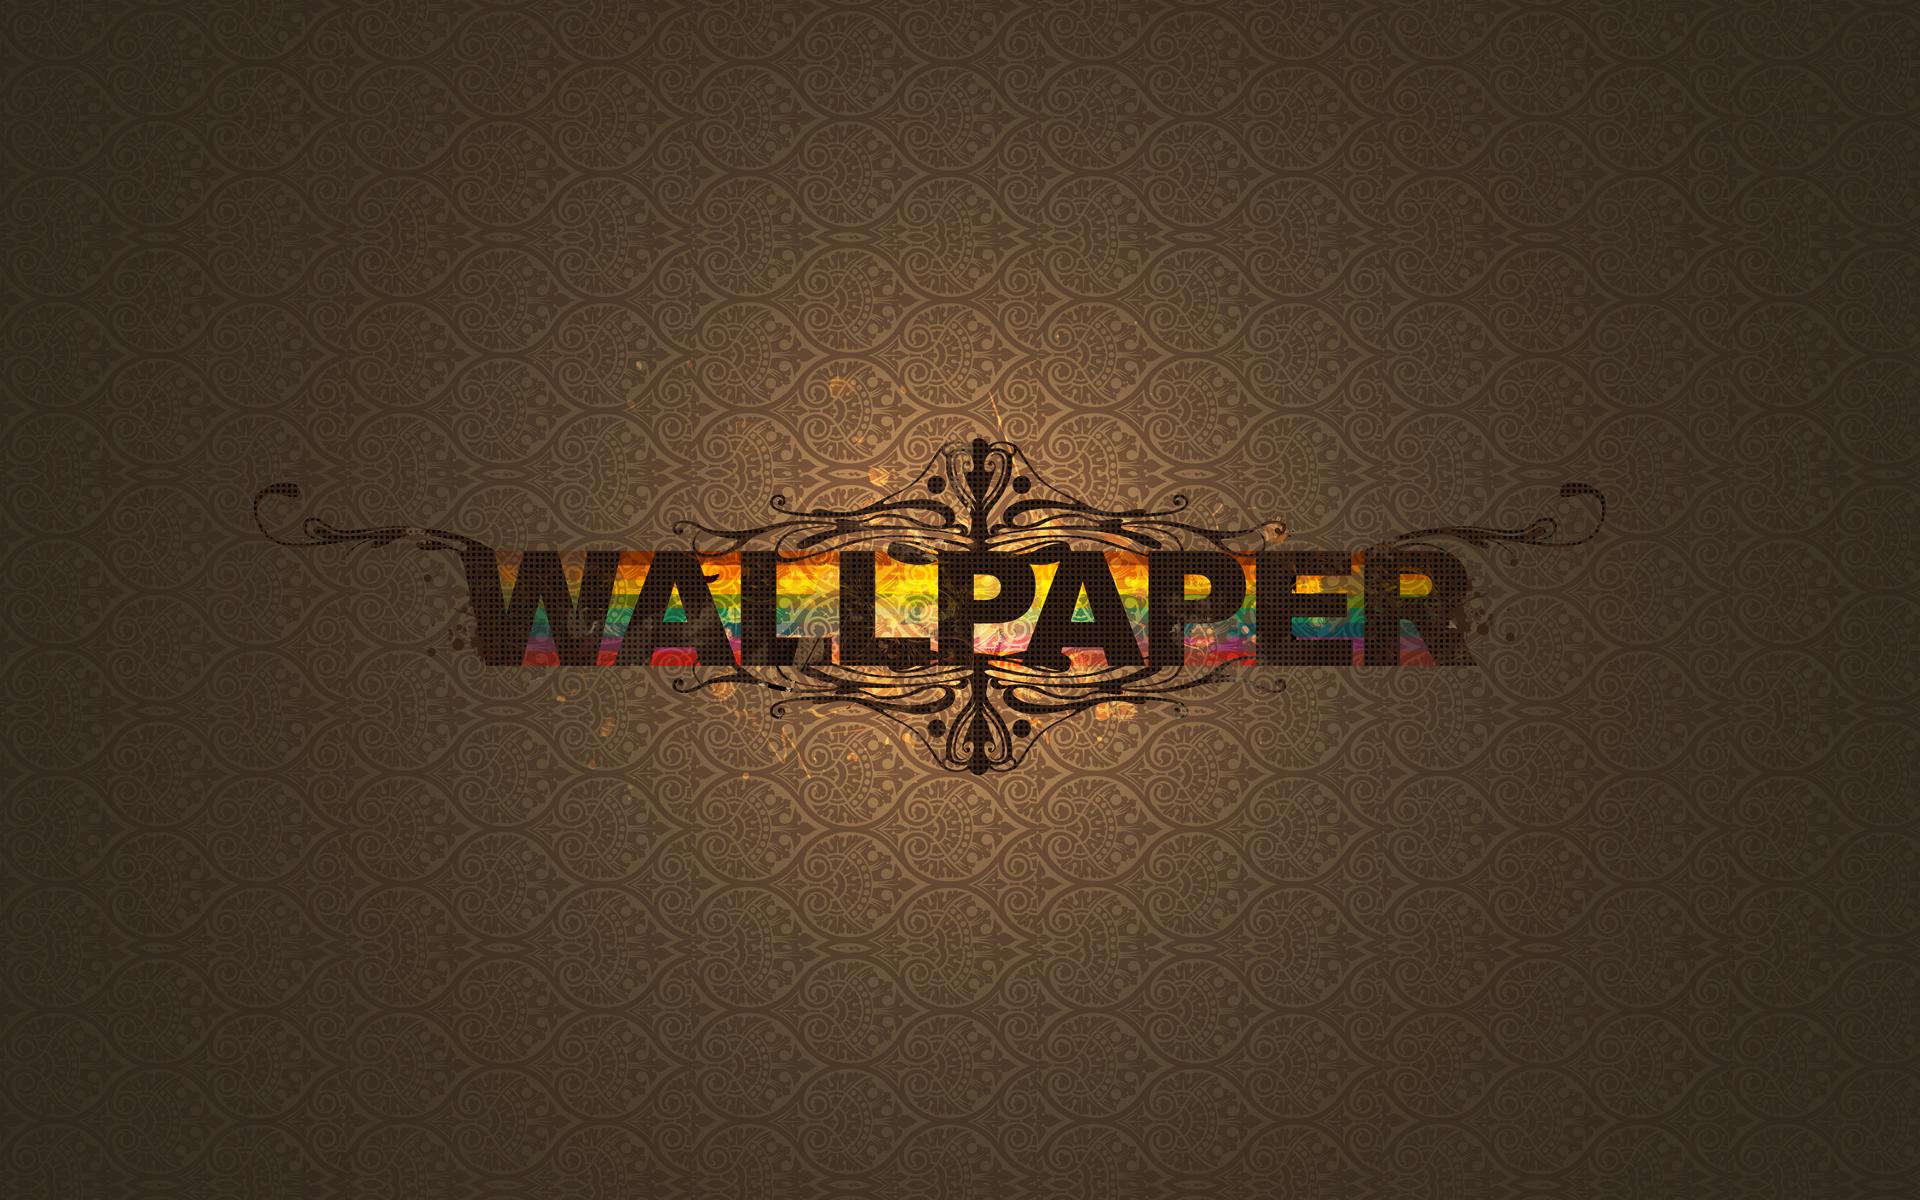 [Wallpaper] HD wallpaper collection vol.1 Wallpaper_by_O_nay